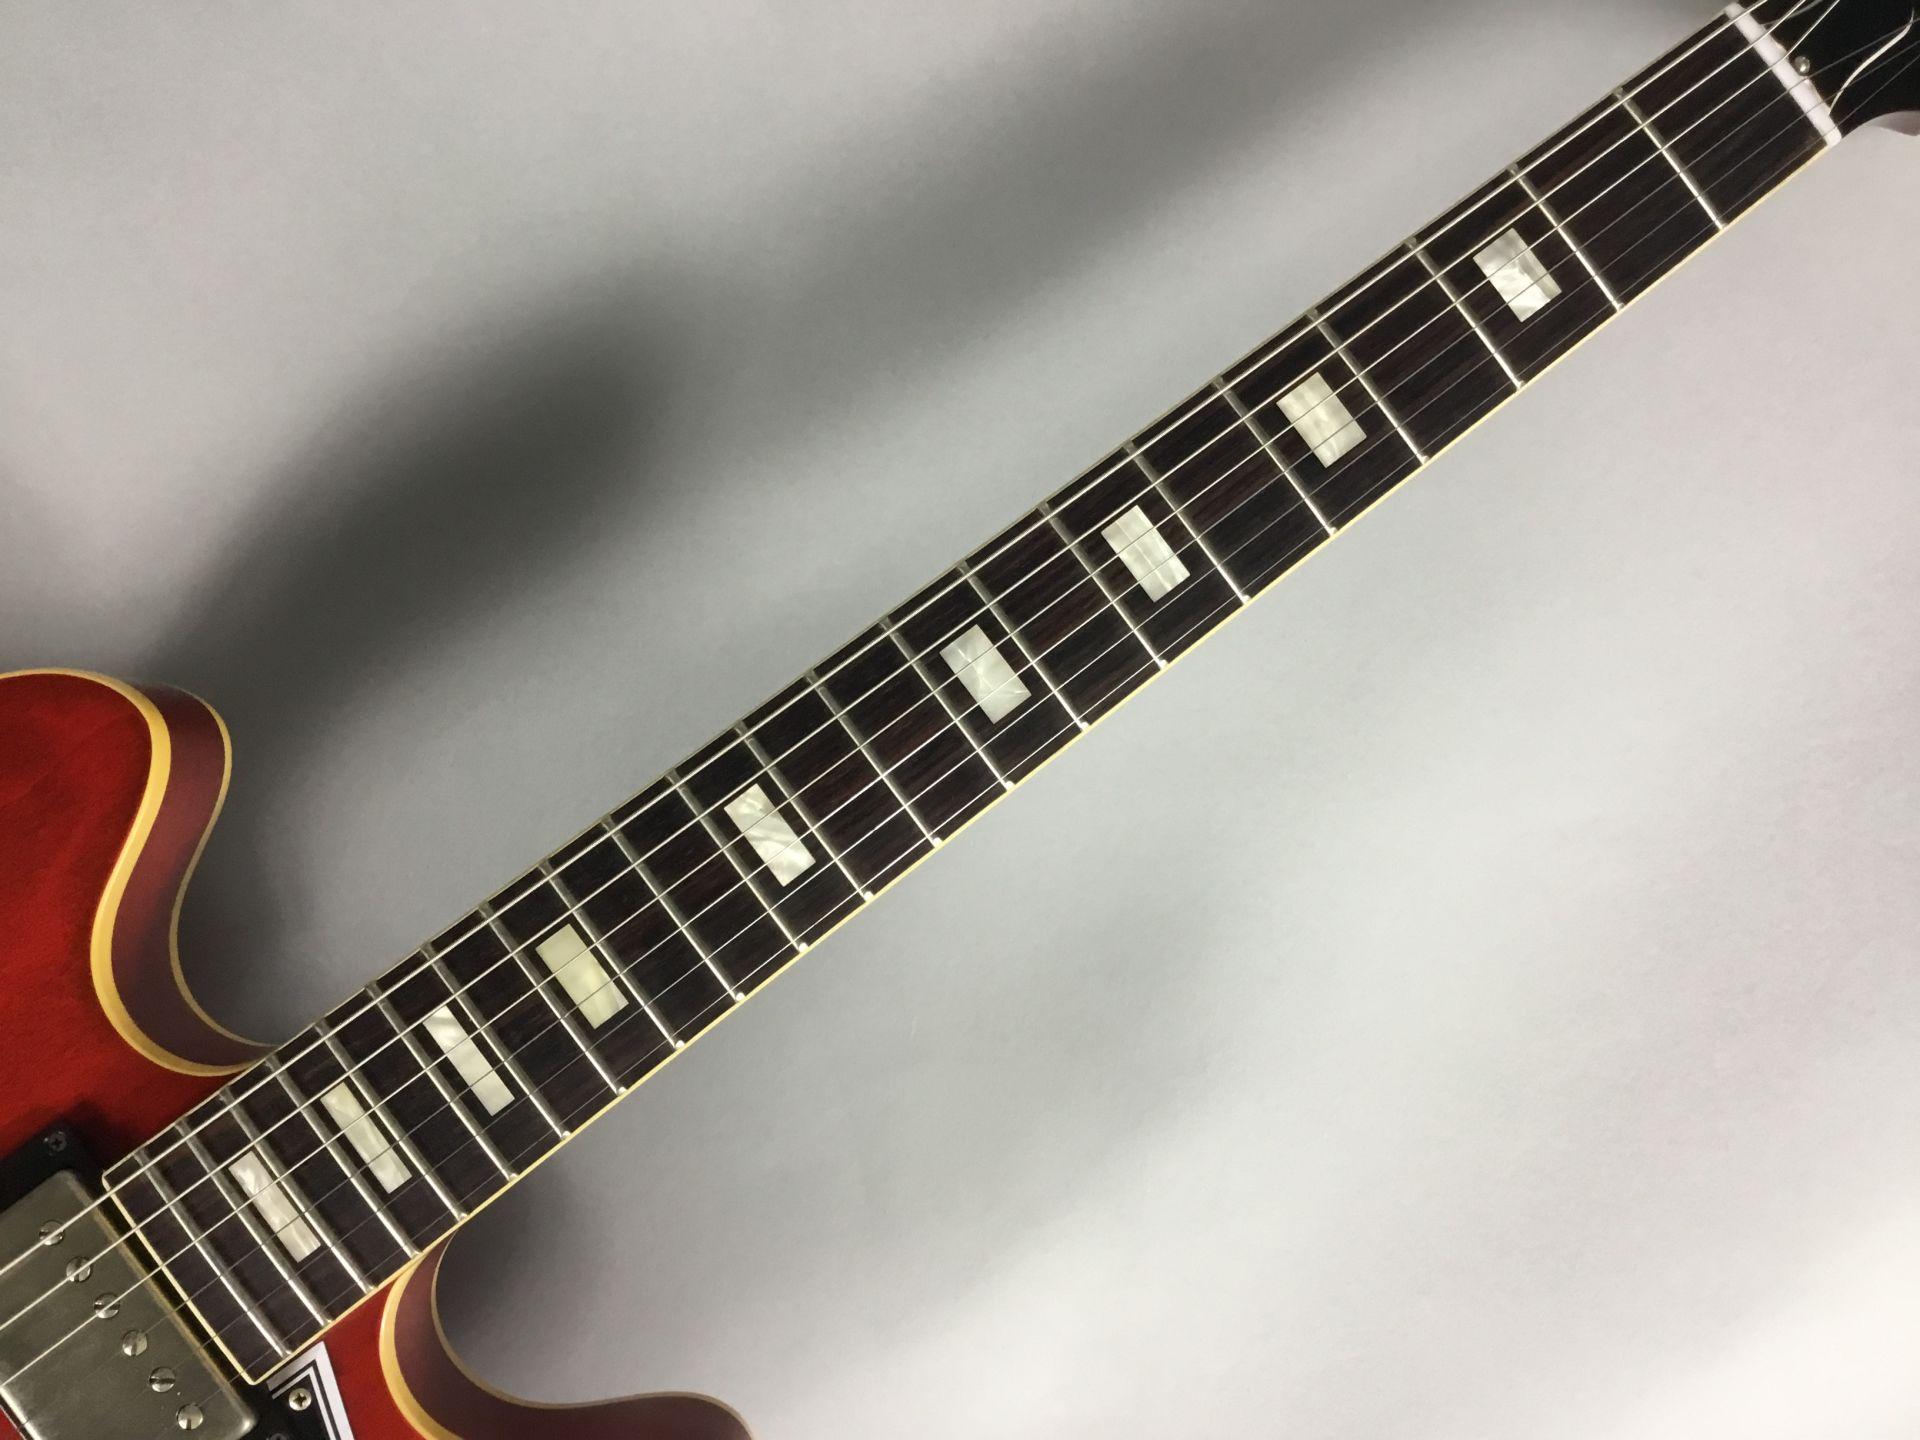 Gibson ES-335 1963 Bigsbyのボディバック-アップ画像